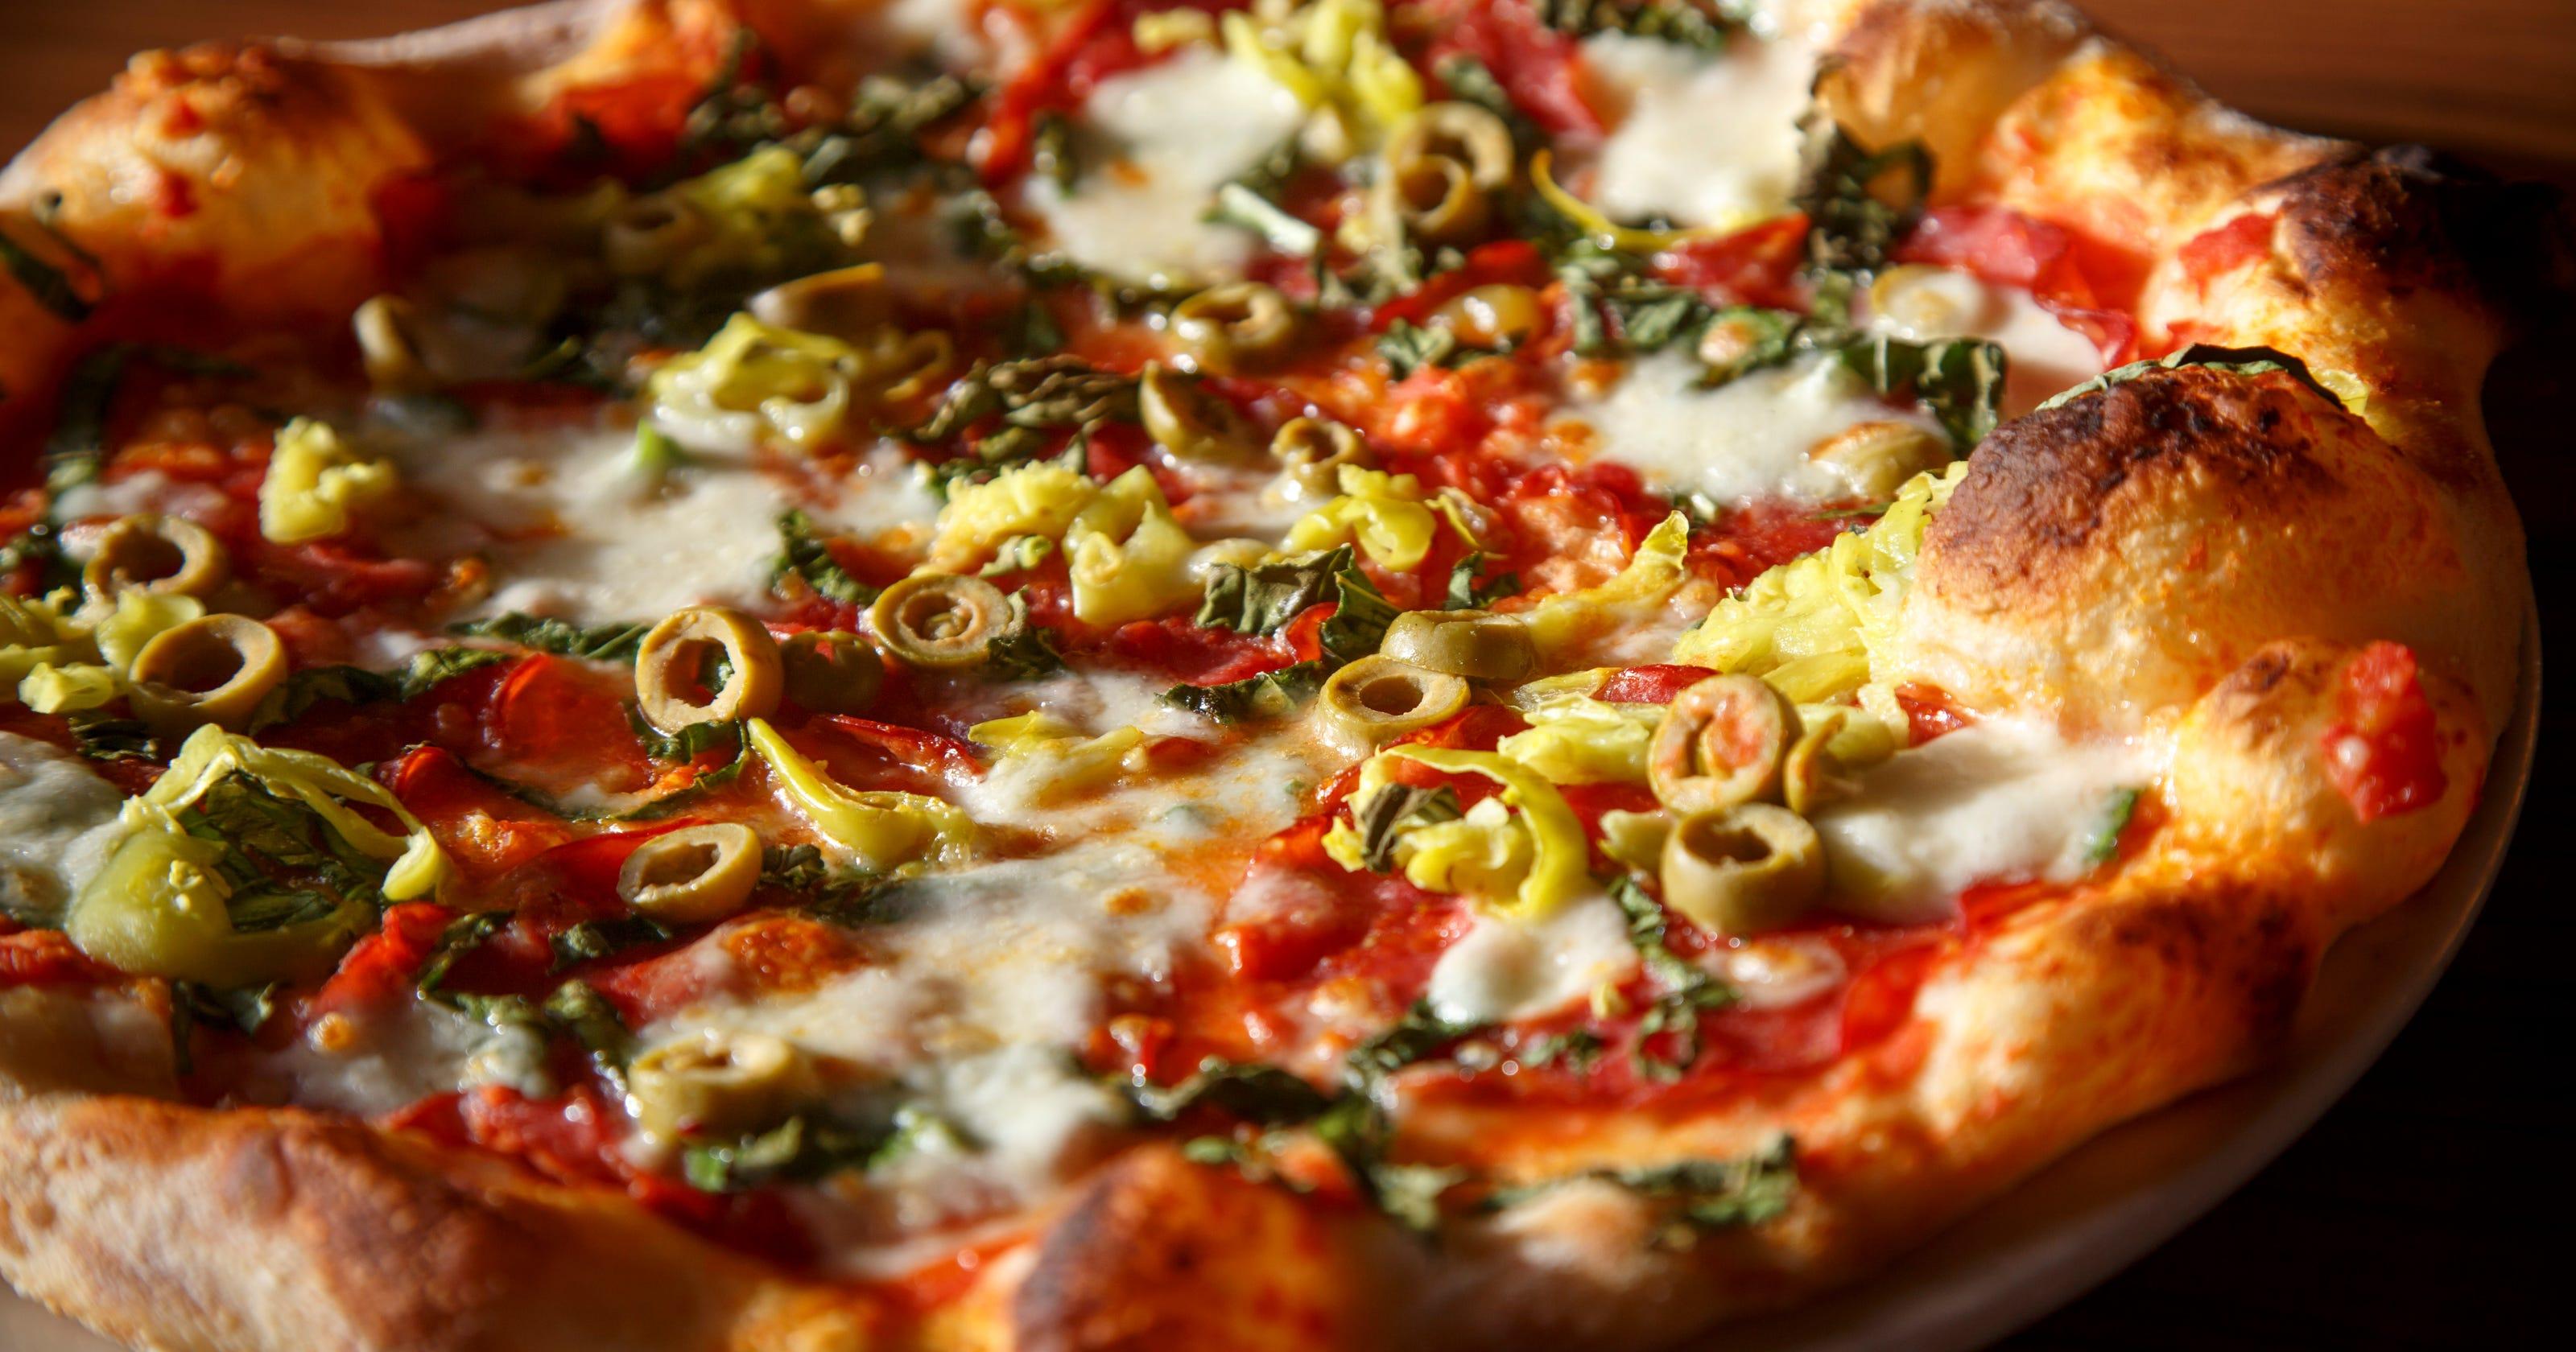 Blaze 3-minute pizza asks to open in West Allis